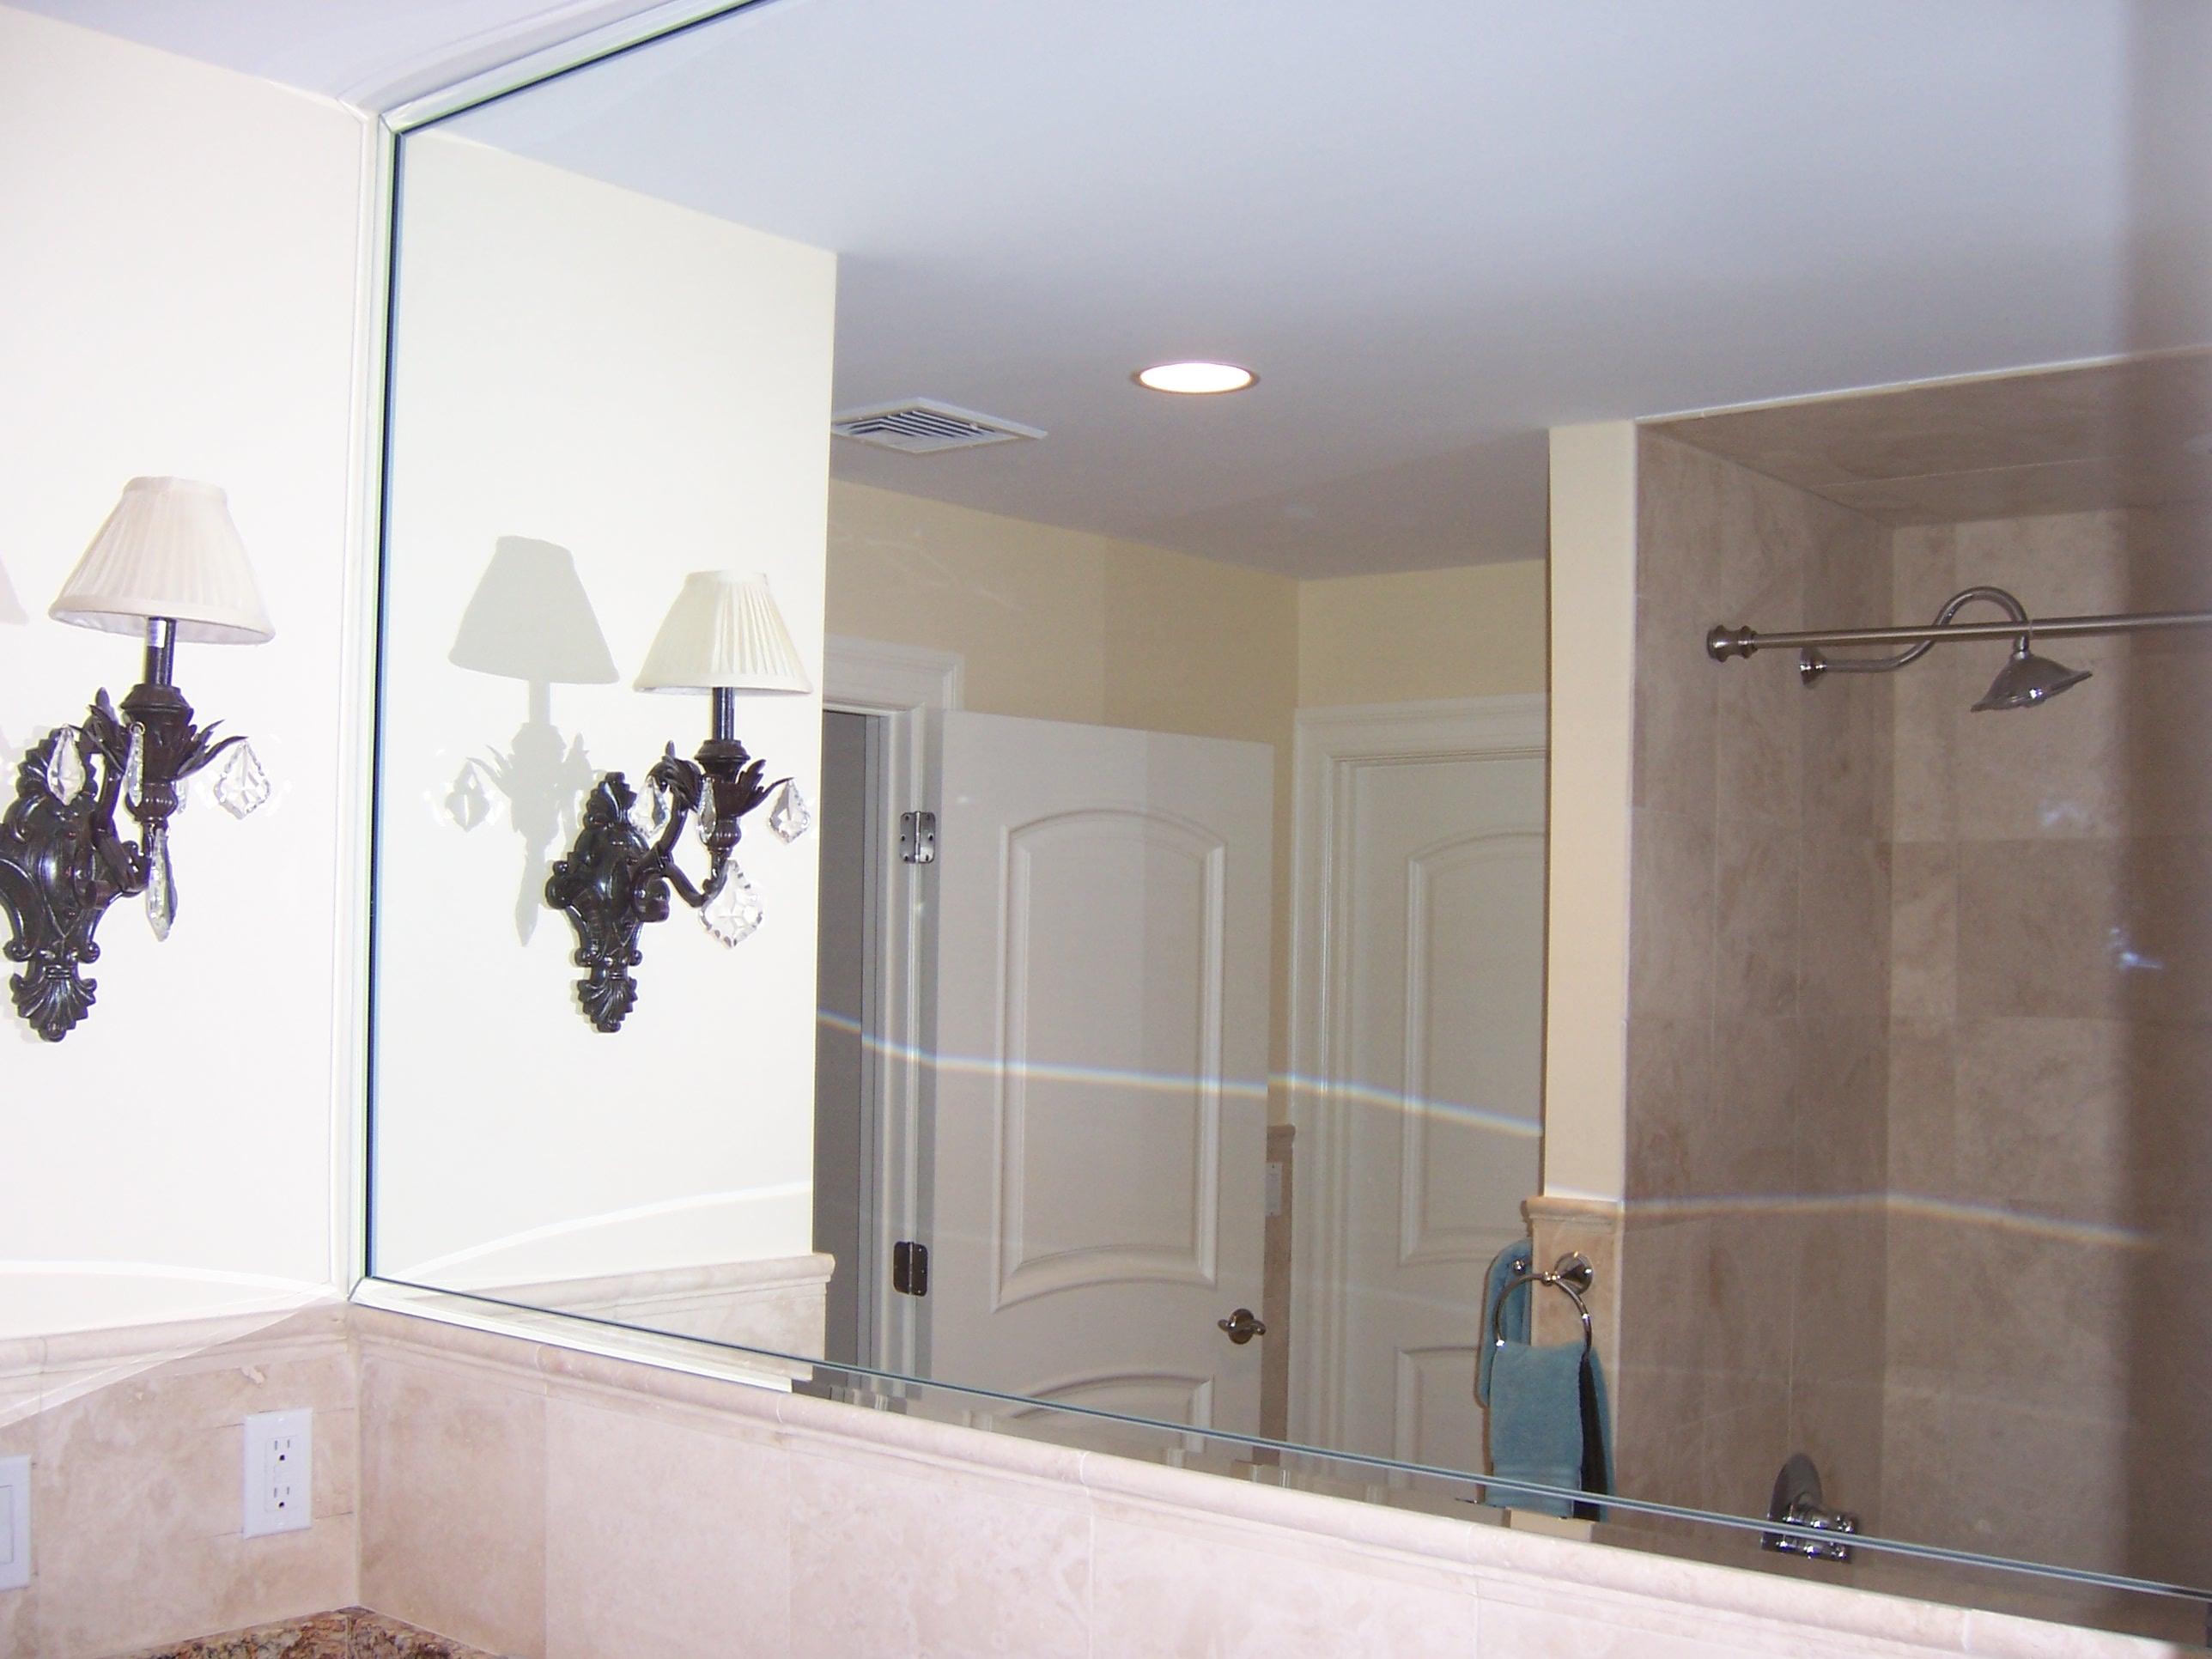 96 Bronze Mirrors For Bathrooms Interior Designs For Bathrooms With Modern Bathroom Tub